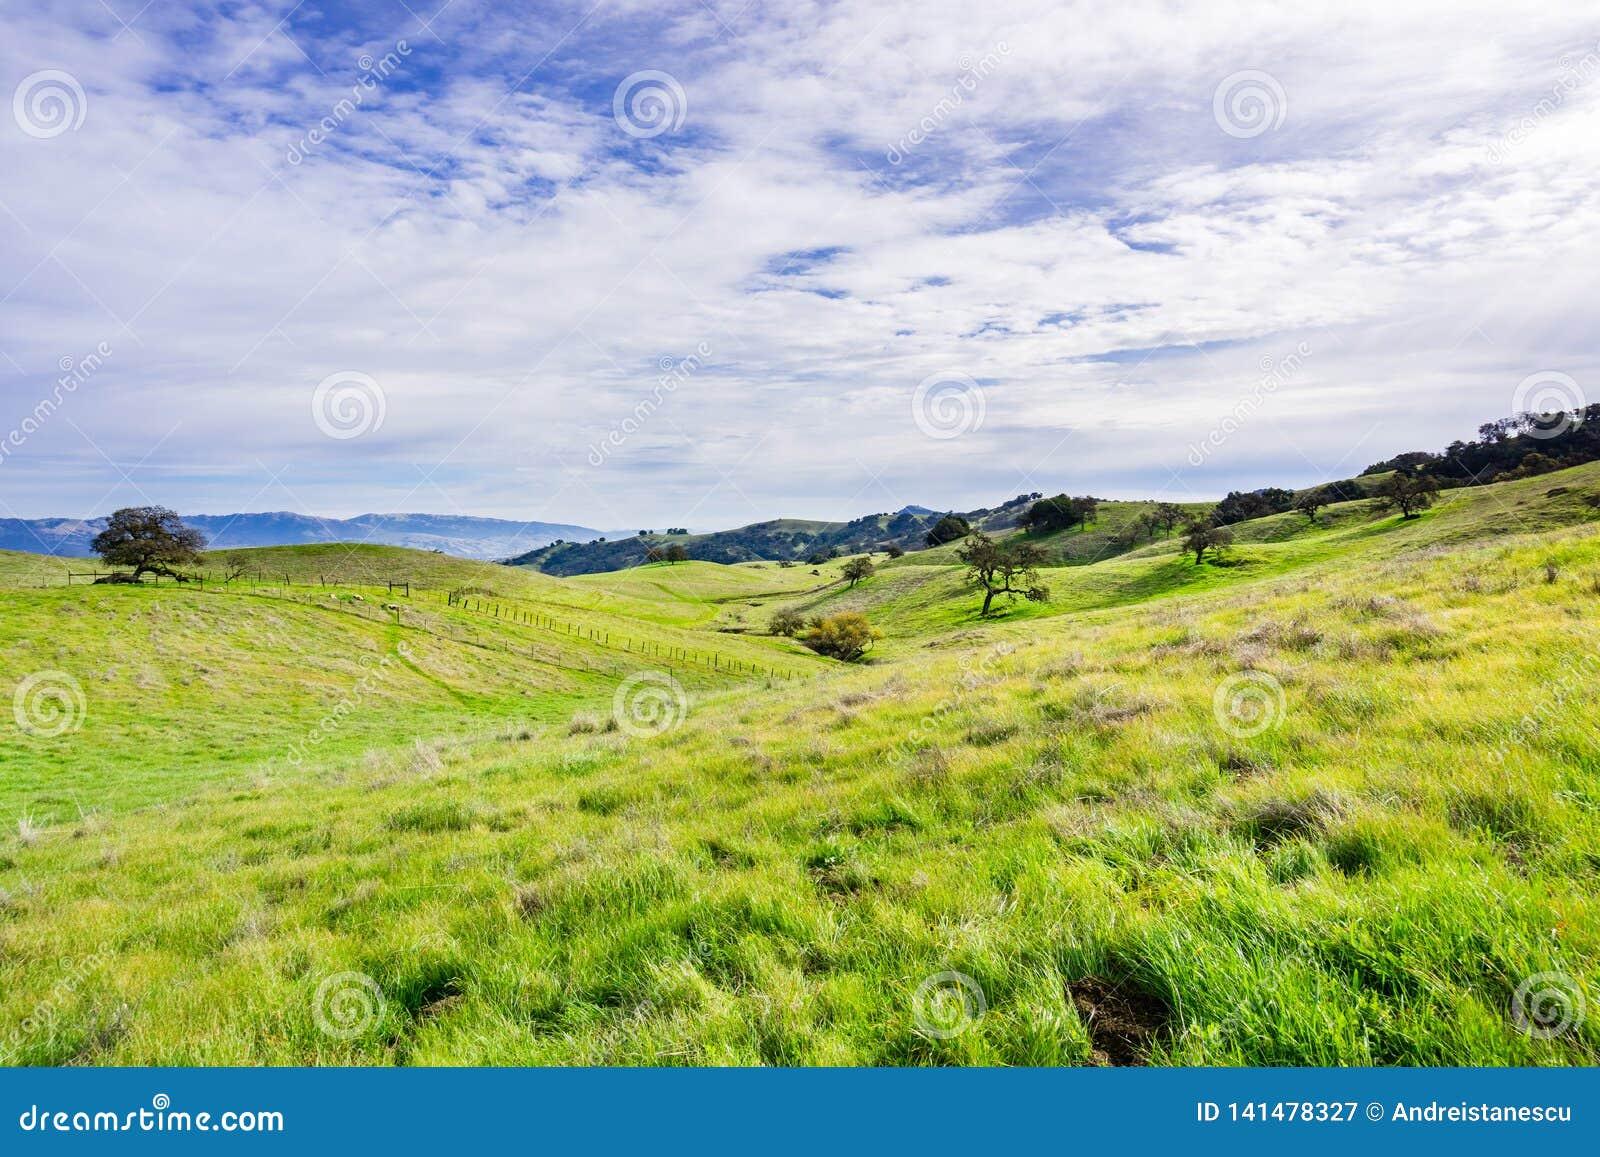 Vista panorâmica sobre os montes e o vale da conserva do espaço aberto do vale do chacal, Morgan Hill, área de San Francisco Bay